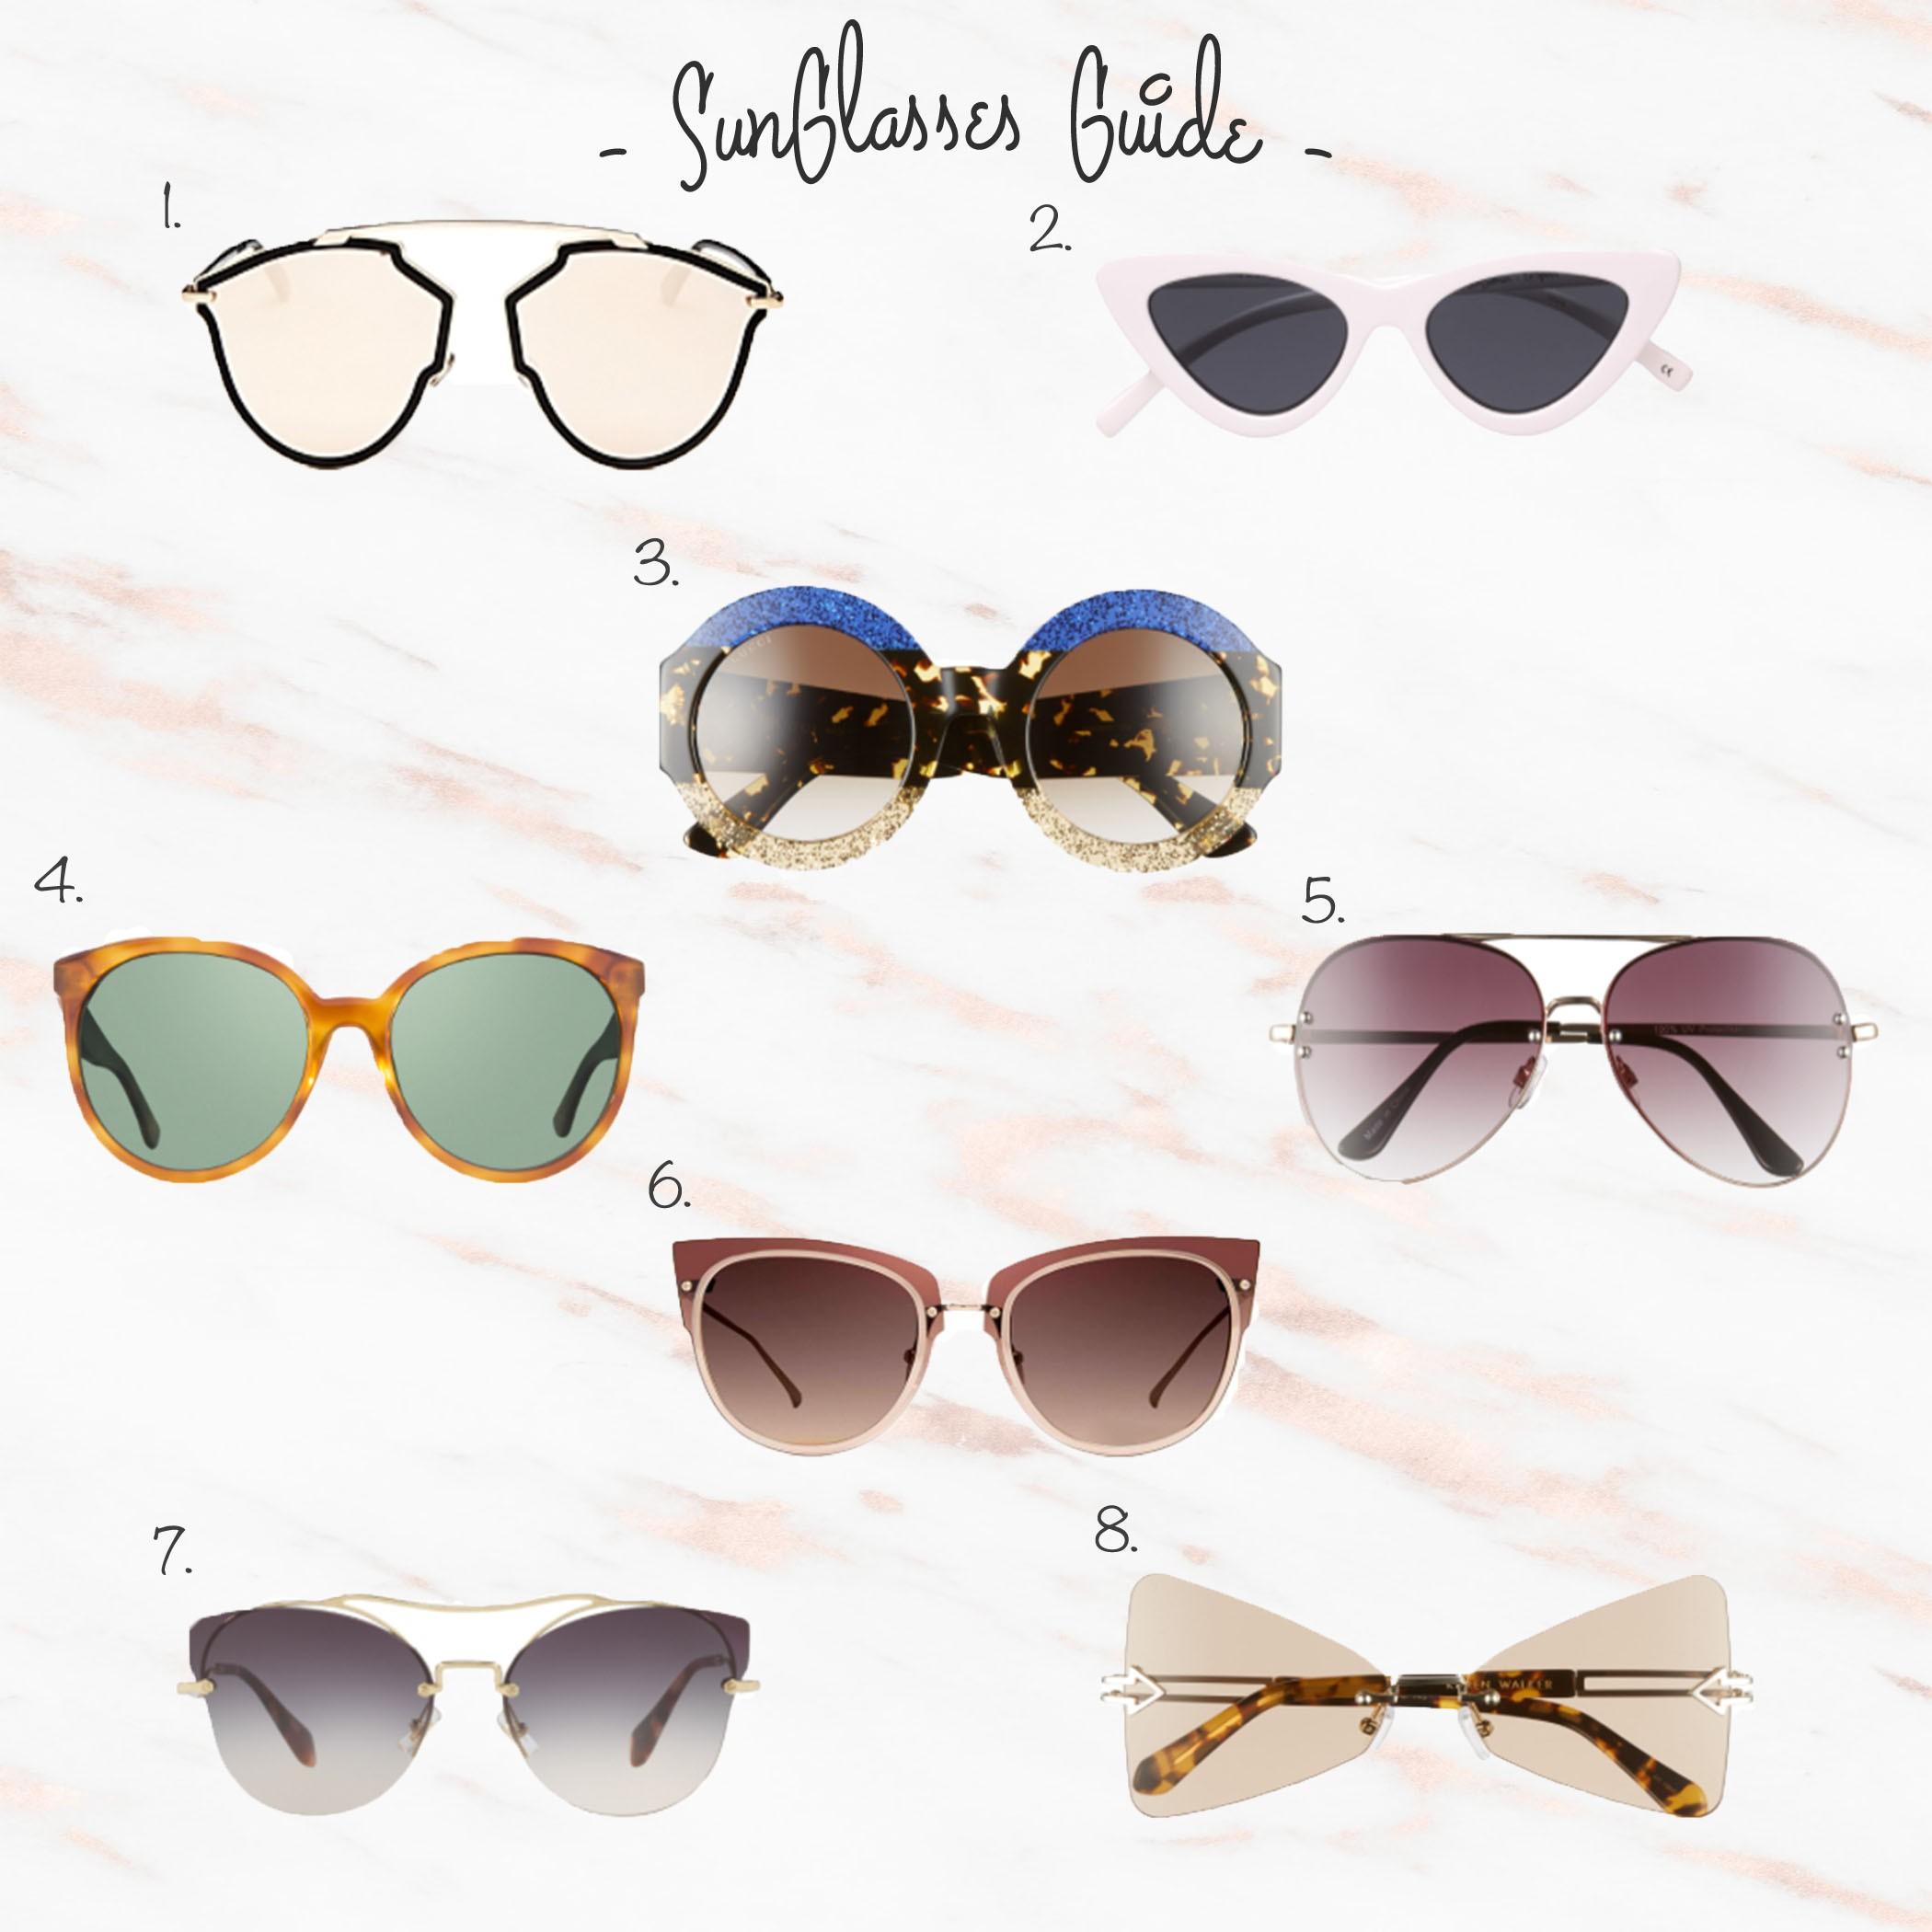 5b26e258ad83 Diff Eyewear Cosmo | 5. BP Oversize Mirrored Sunglasses | 6. Diff Eyewear  Demi Lovato | 7. Miu Miu Aviator Sunglasses ...